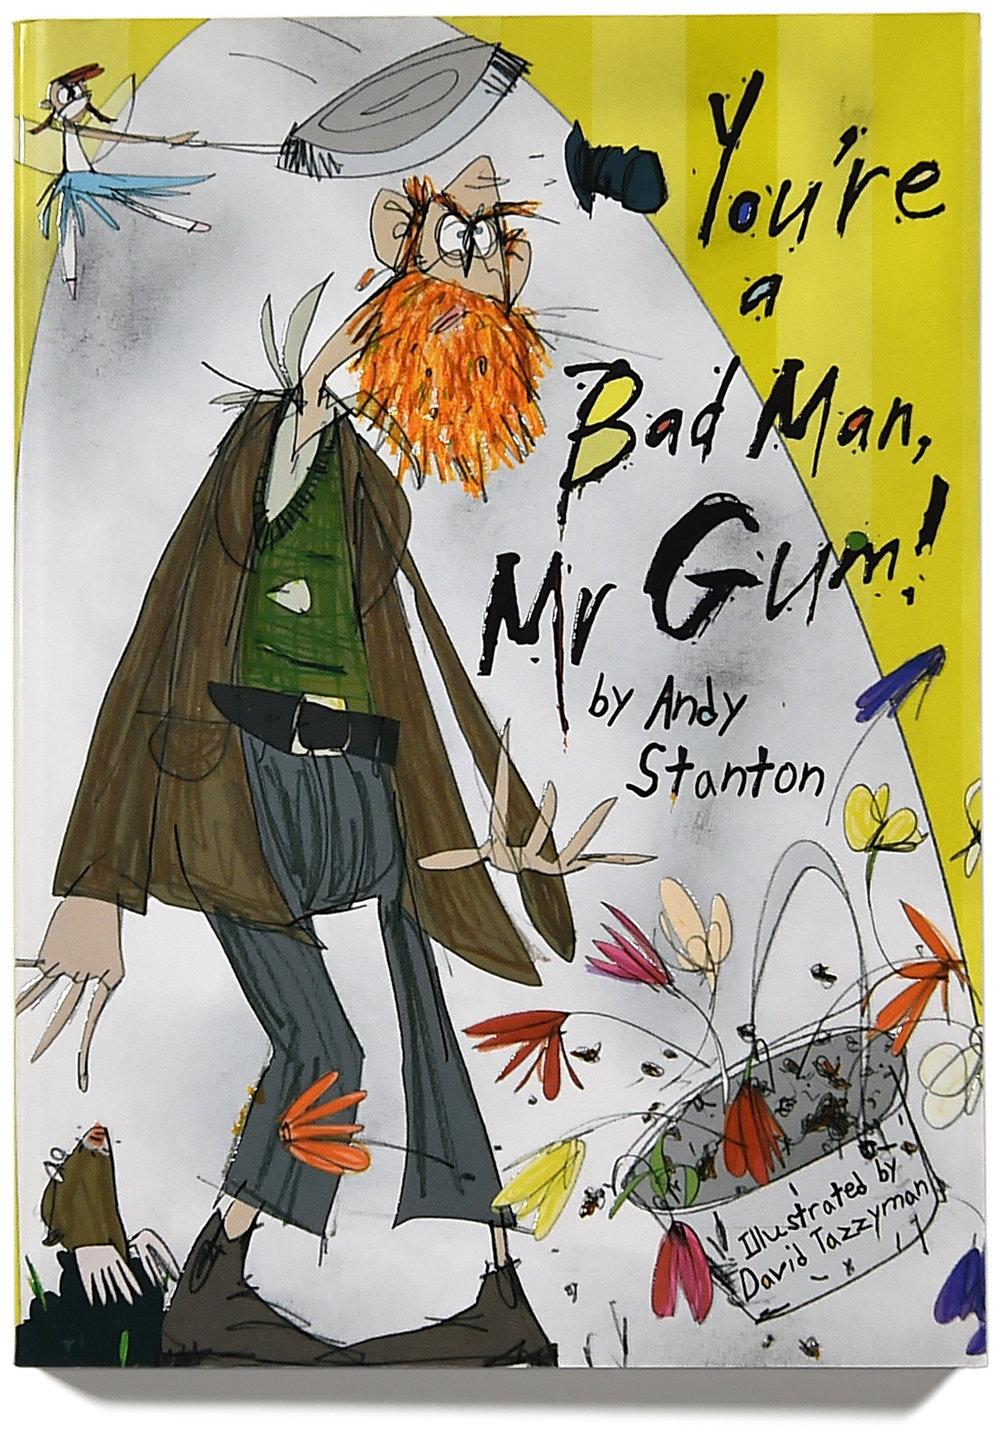 You're a Bad Man Mr gum! cover.FIN.jpg